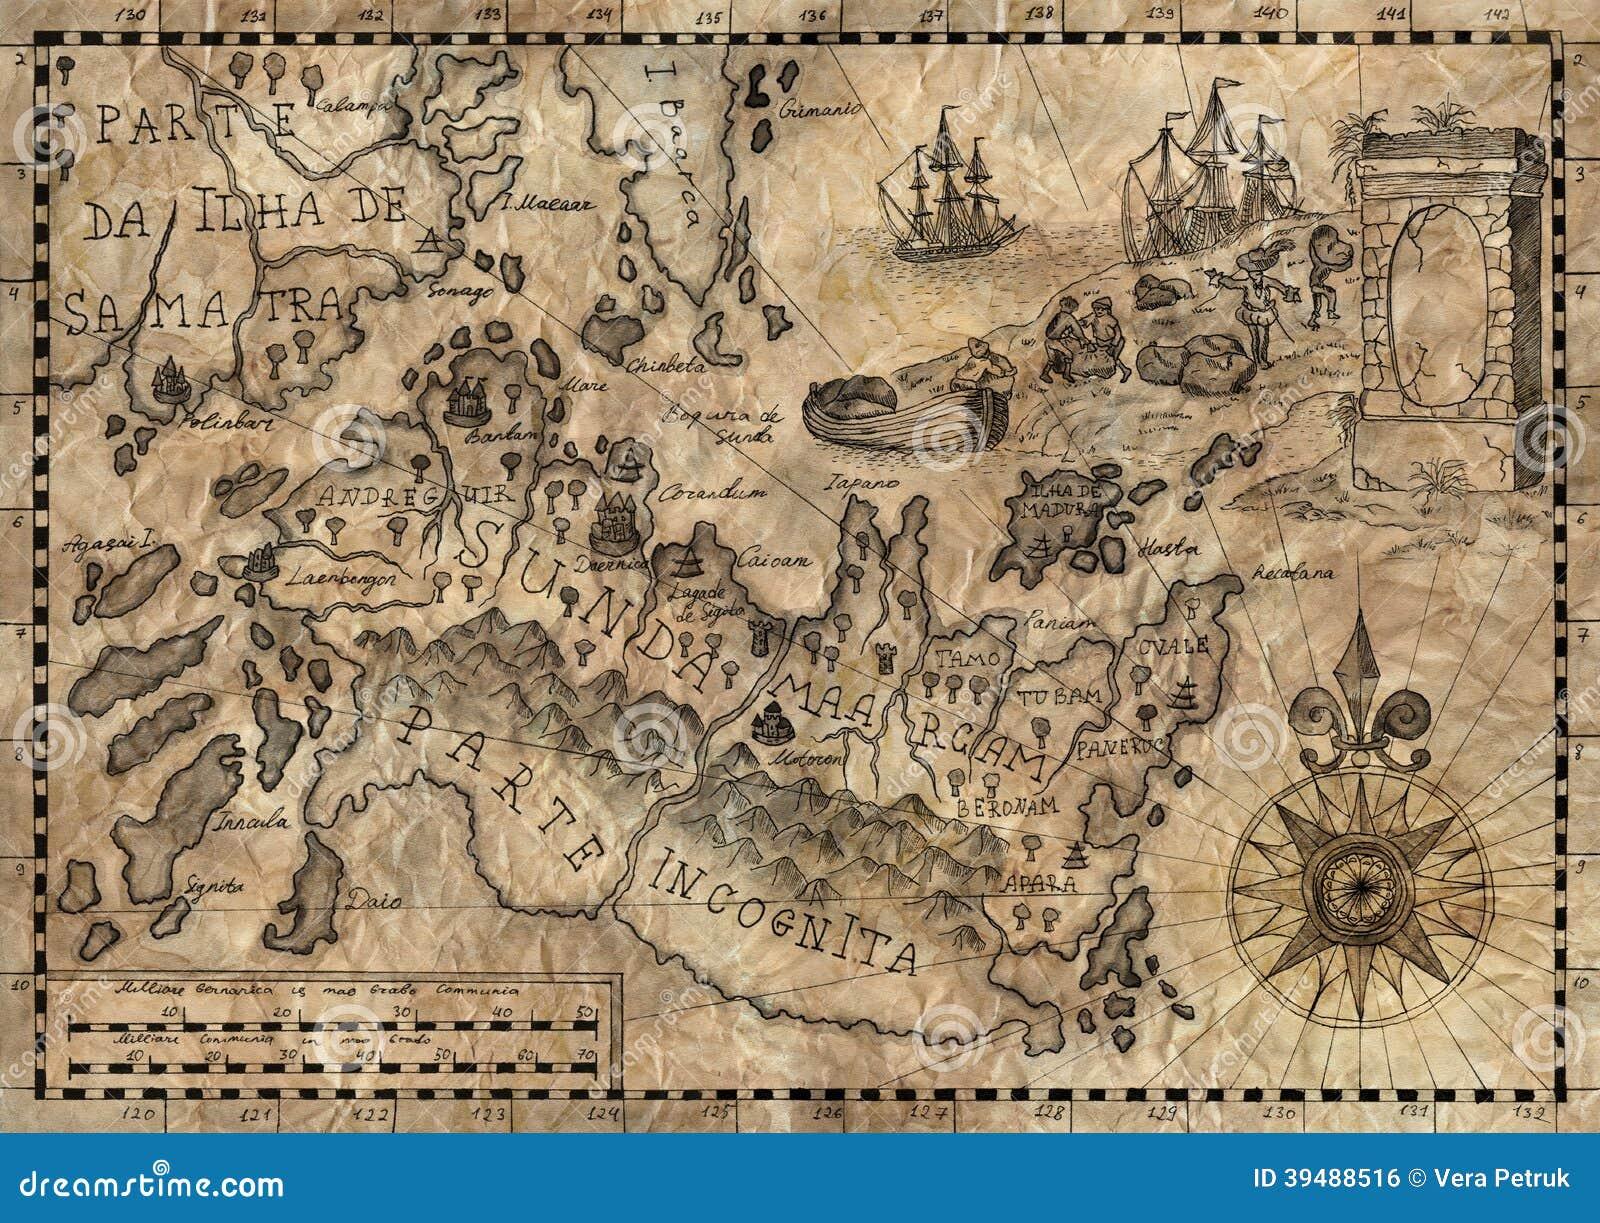 Пиратская карта арт (открытки) beesona.ru.